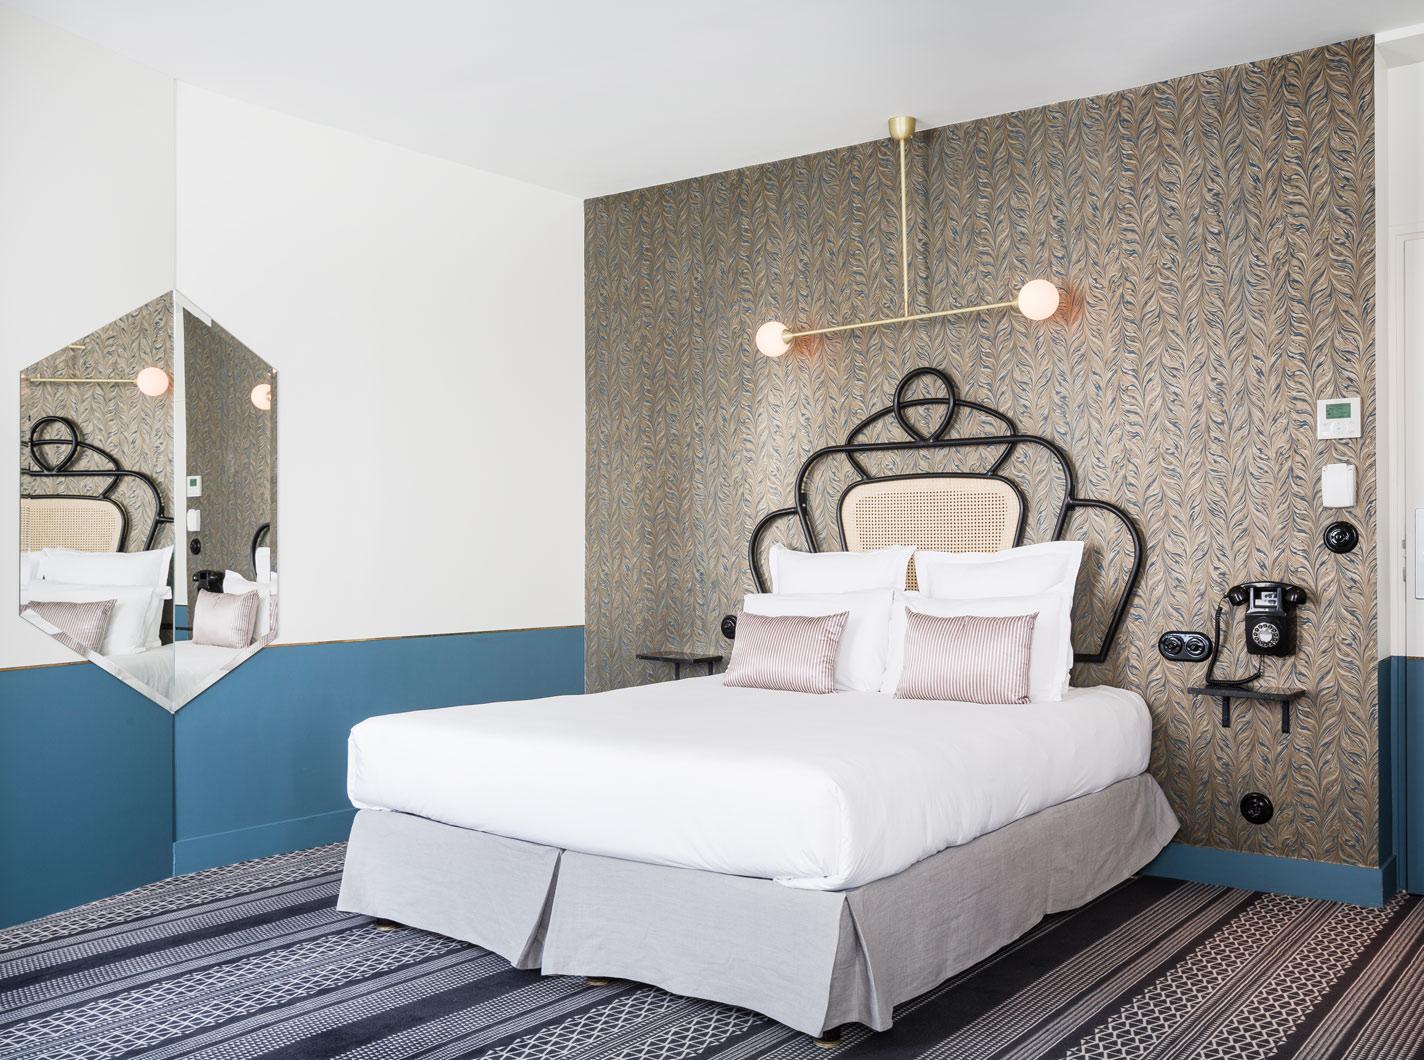 Hotel-Panache-46@2